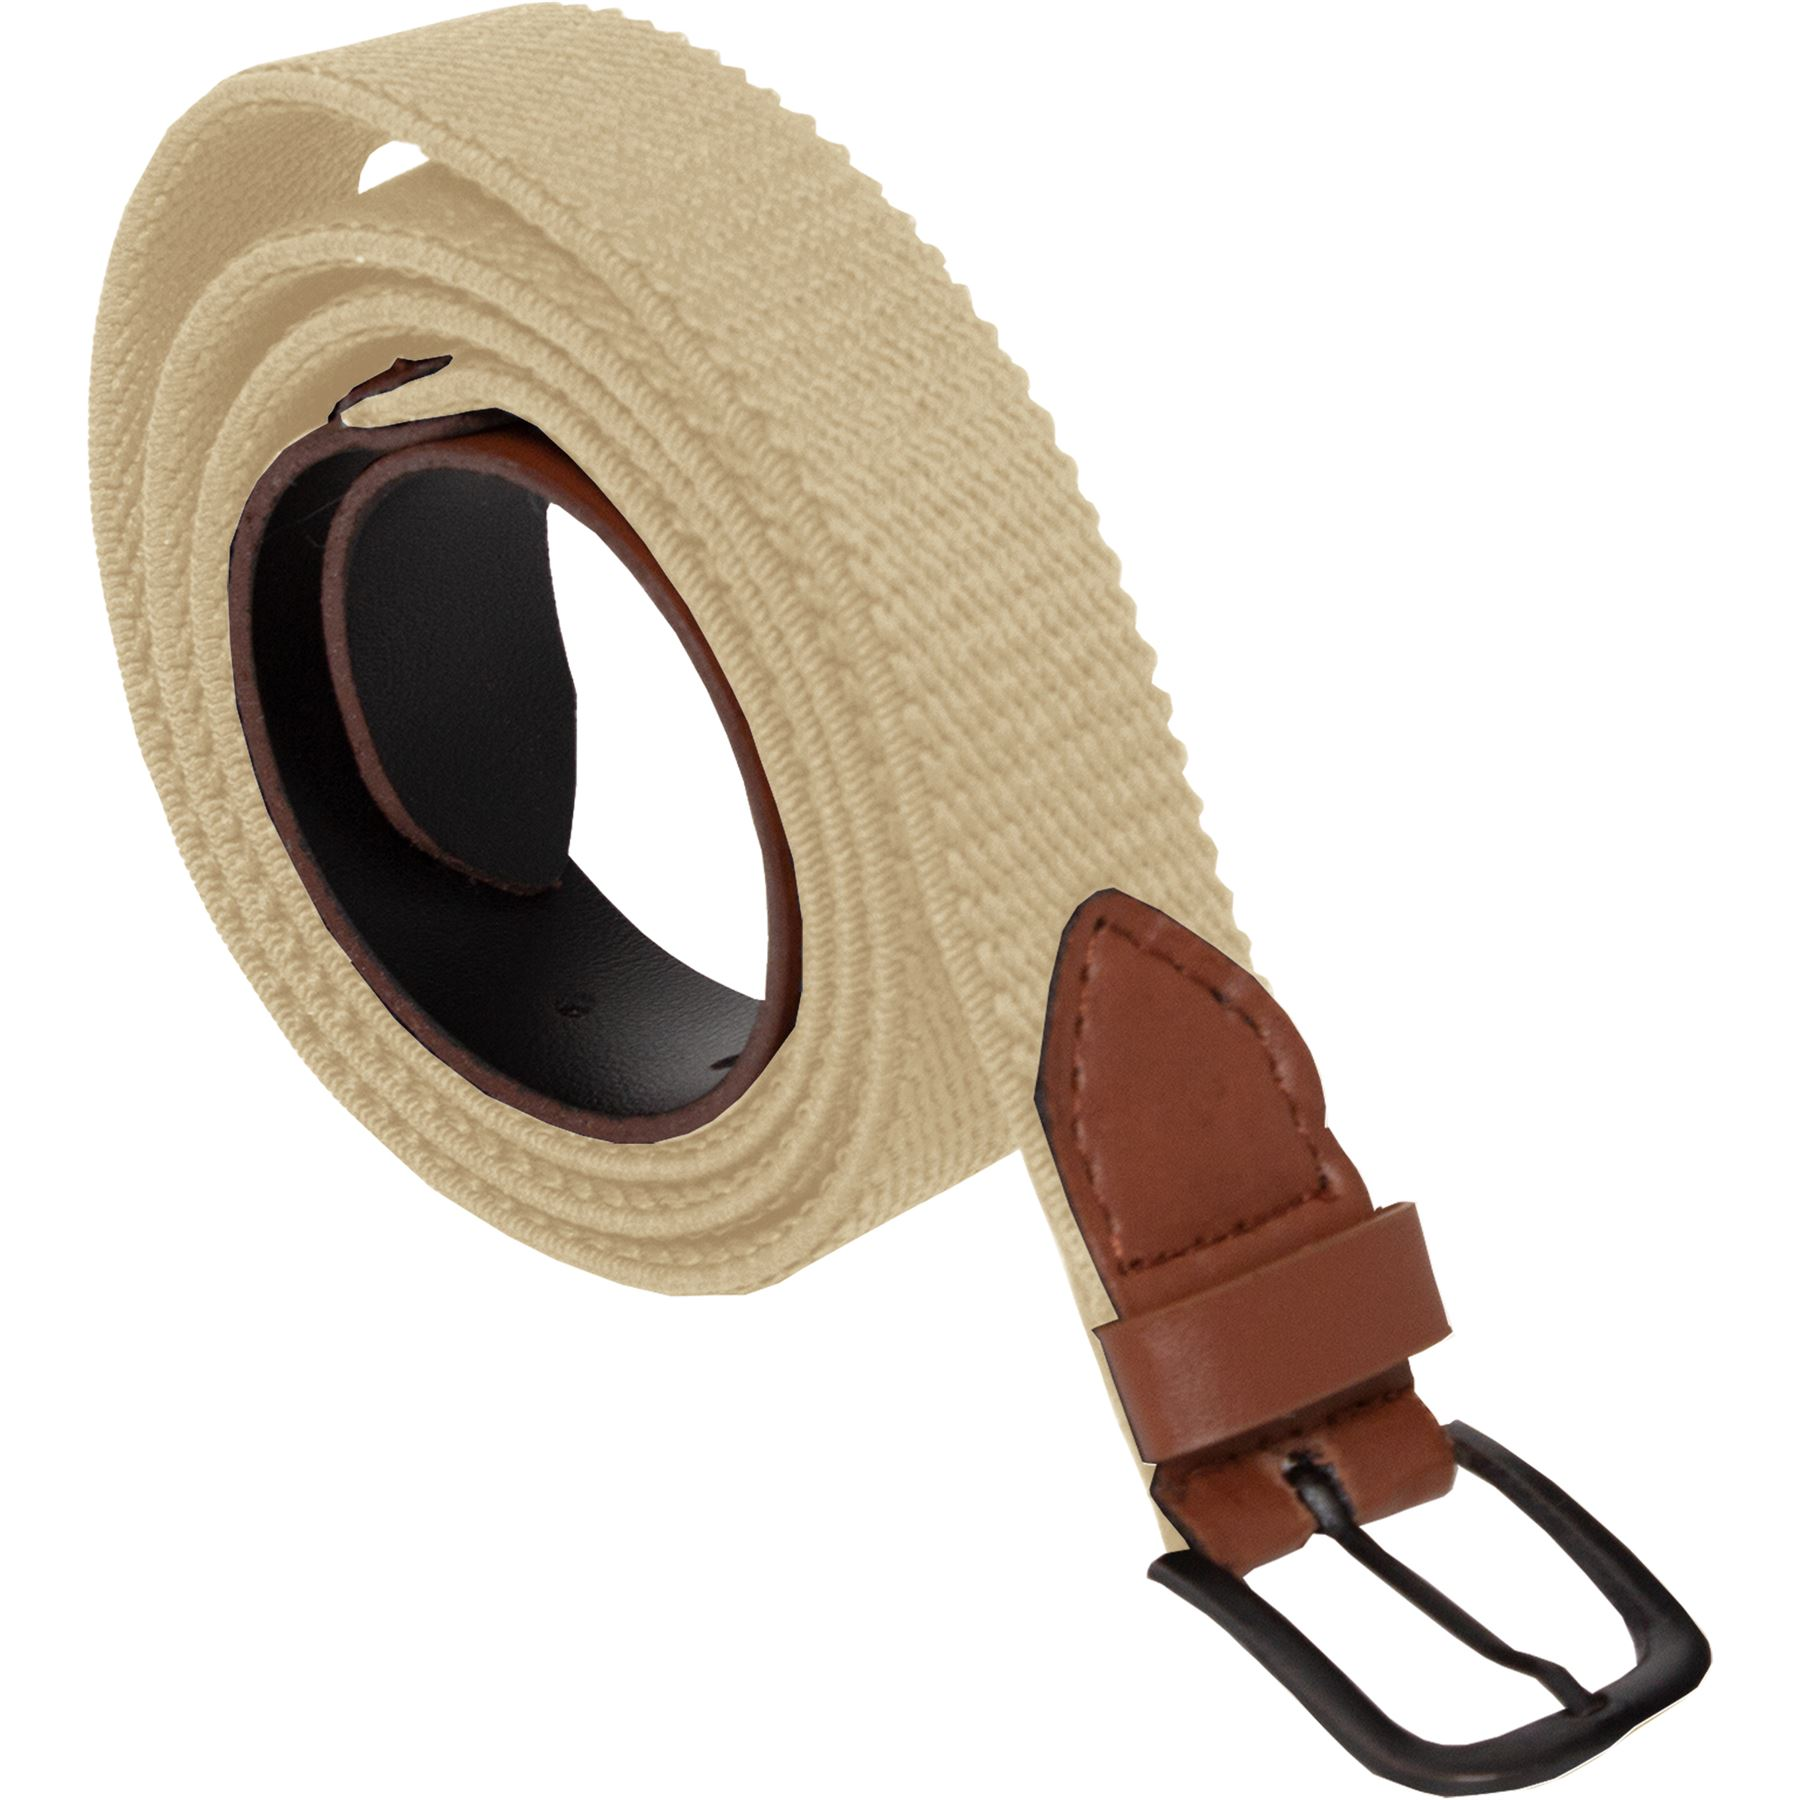 Mens-Ladies-Elasticated-Webbing-Belts-PU-Leather-Trim-Stretch-Canvas-Buckle-Belt Indexbild 8